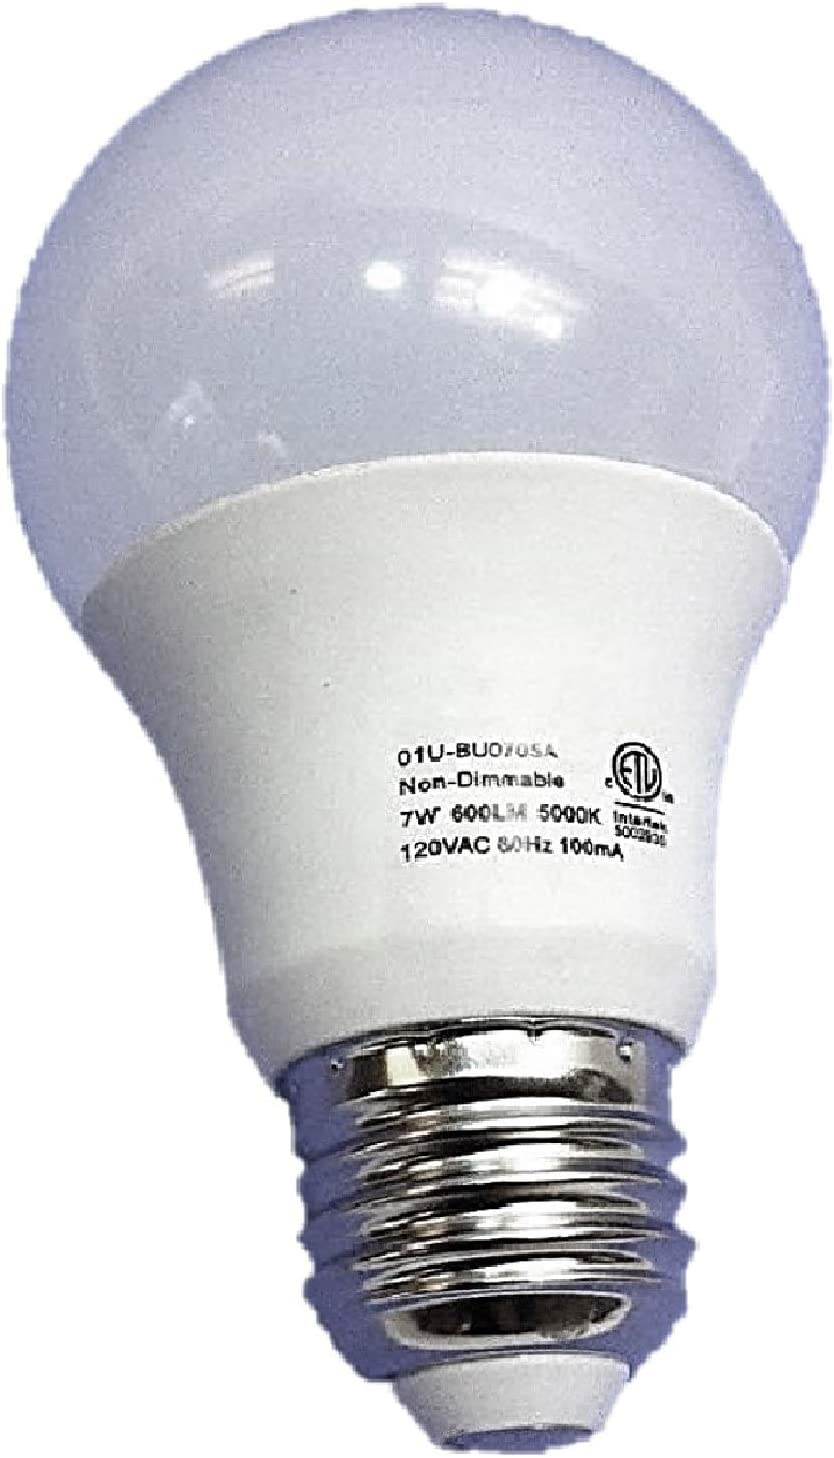 5000k 7-Watt New NON Dimmable Soft White Glow 100 pack LED LIGHT BULBS E26 A19 40 watt equivalent 600 Lumens